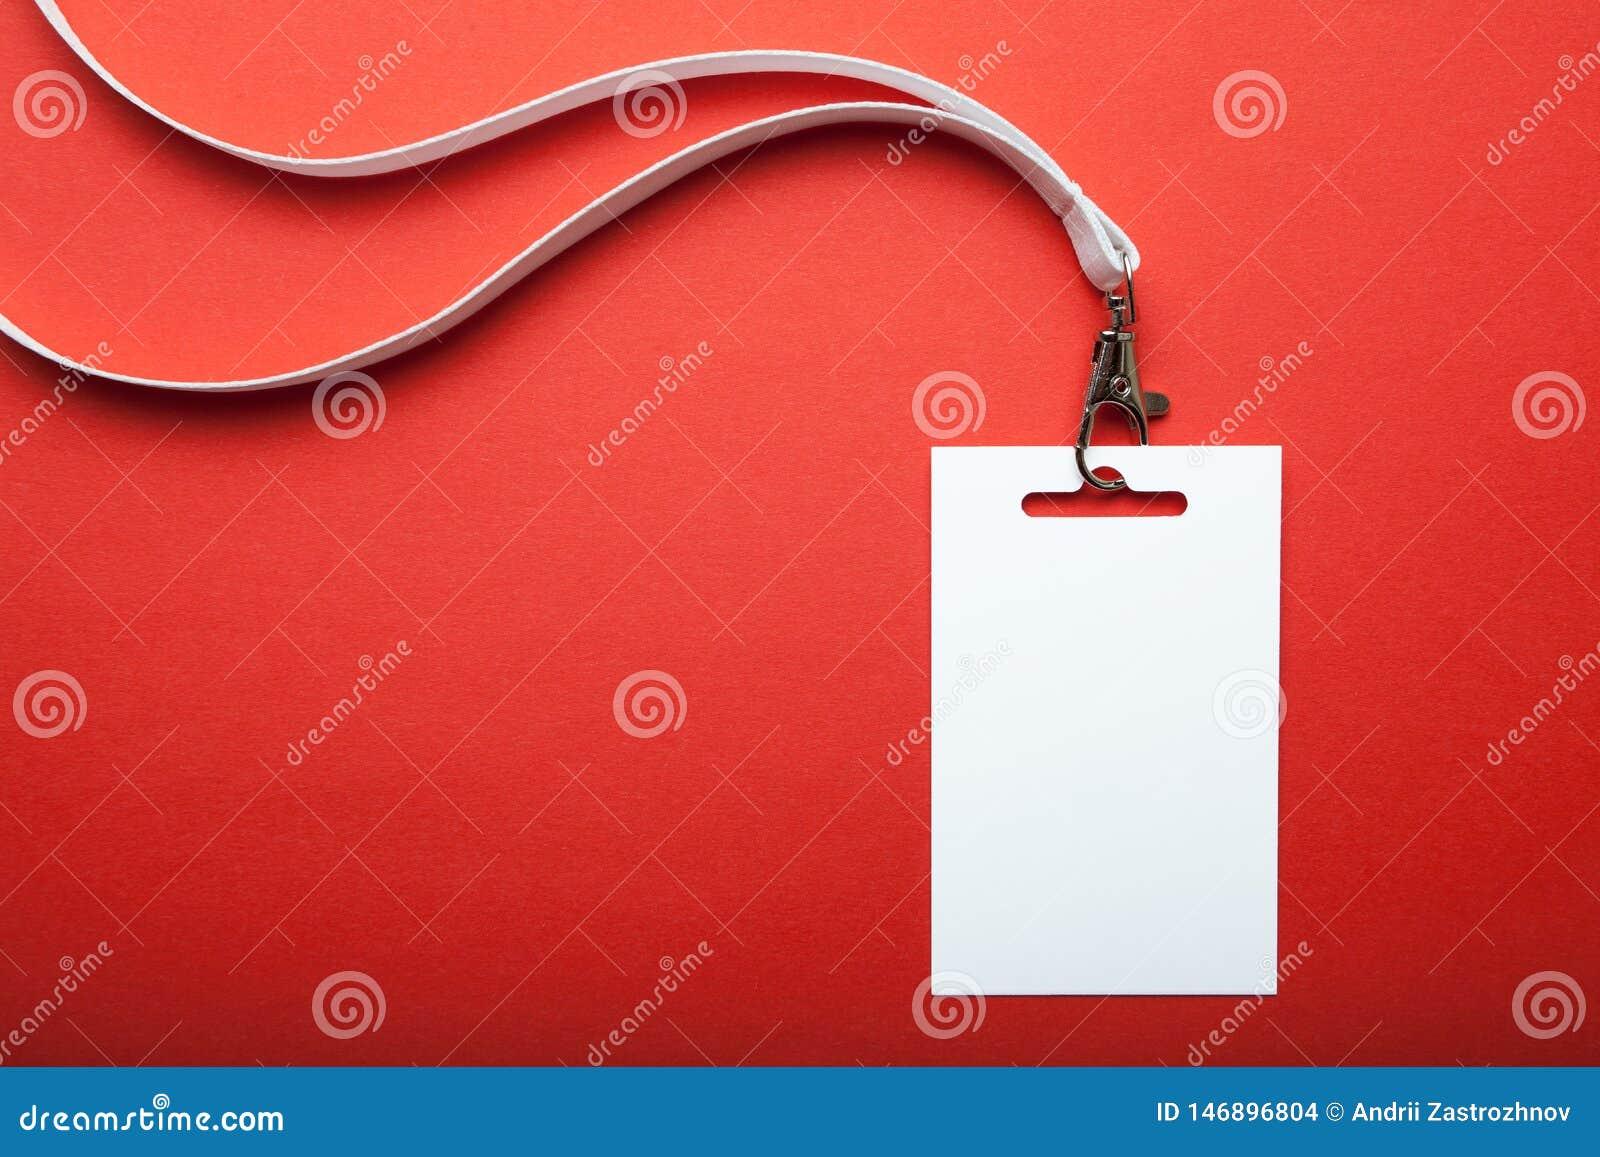 Пустая бирка имени, с белым талрепом на красном цвете Бирка имени пуста для вашего текста r